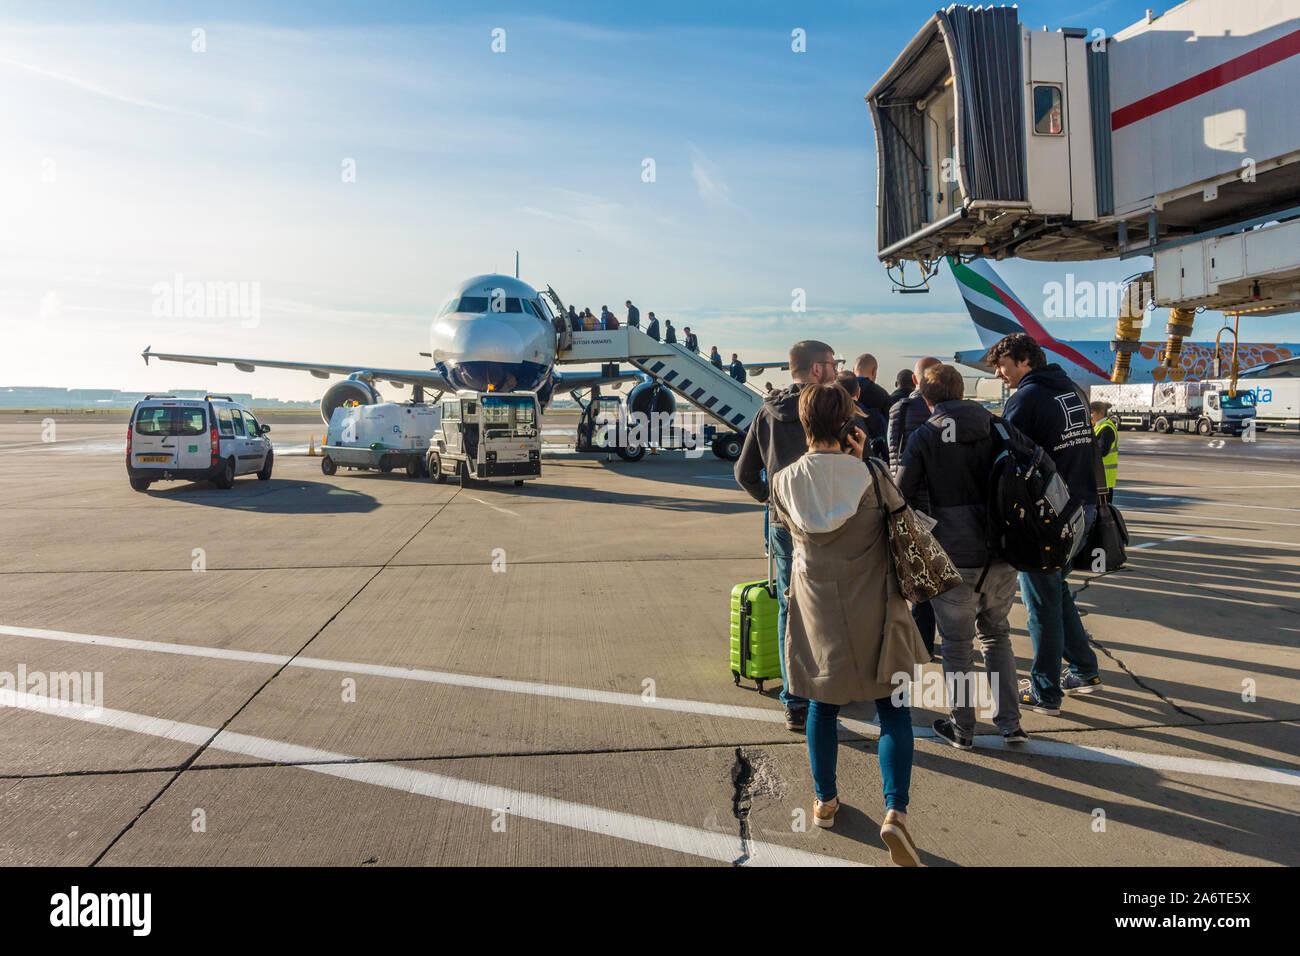 passengers-use-steps-to-board-a-british-airways-plane-heathrow-airport-2A6TE5X.jpg